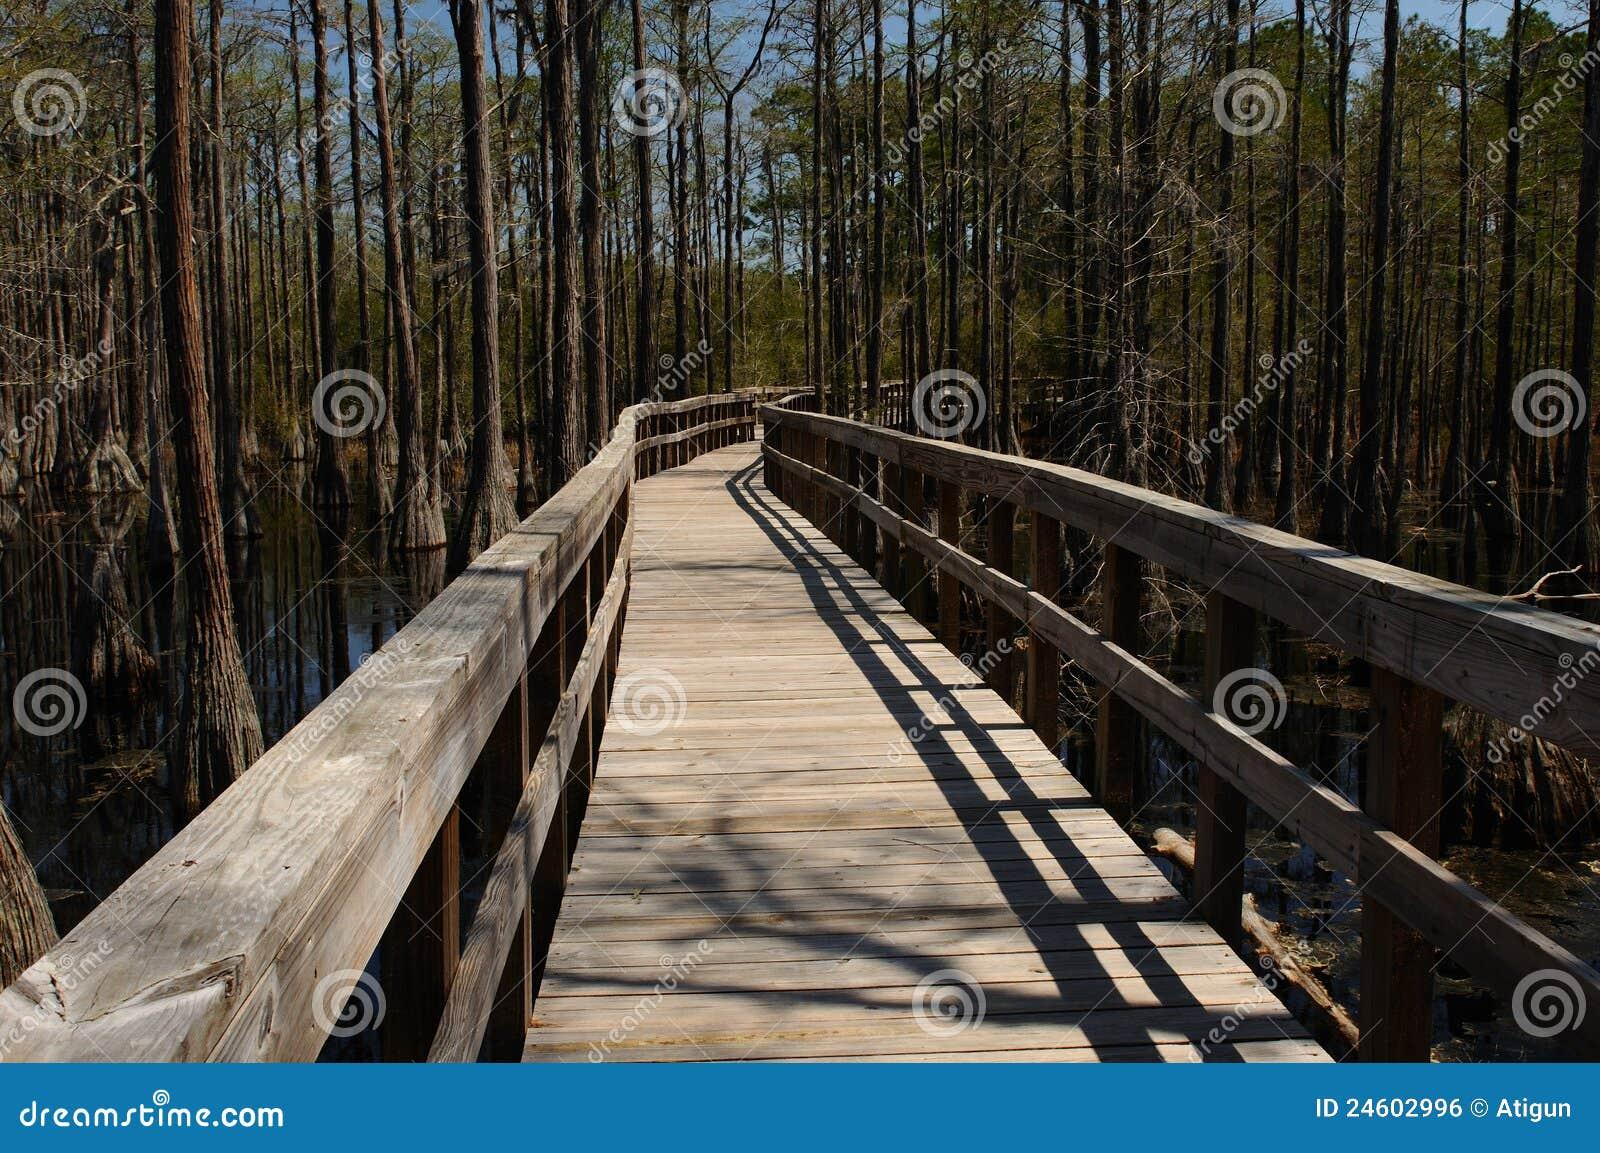 Mangrovie della Florida